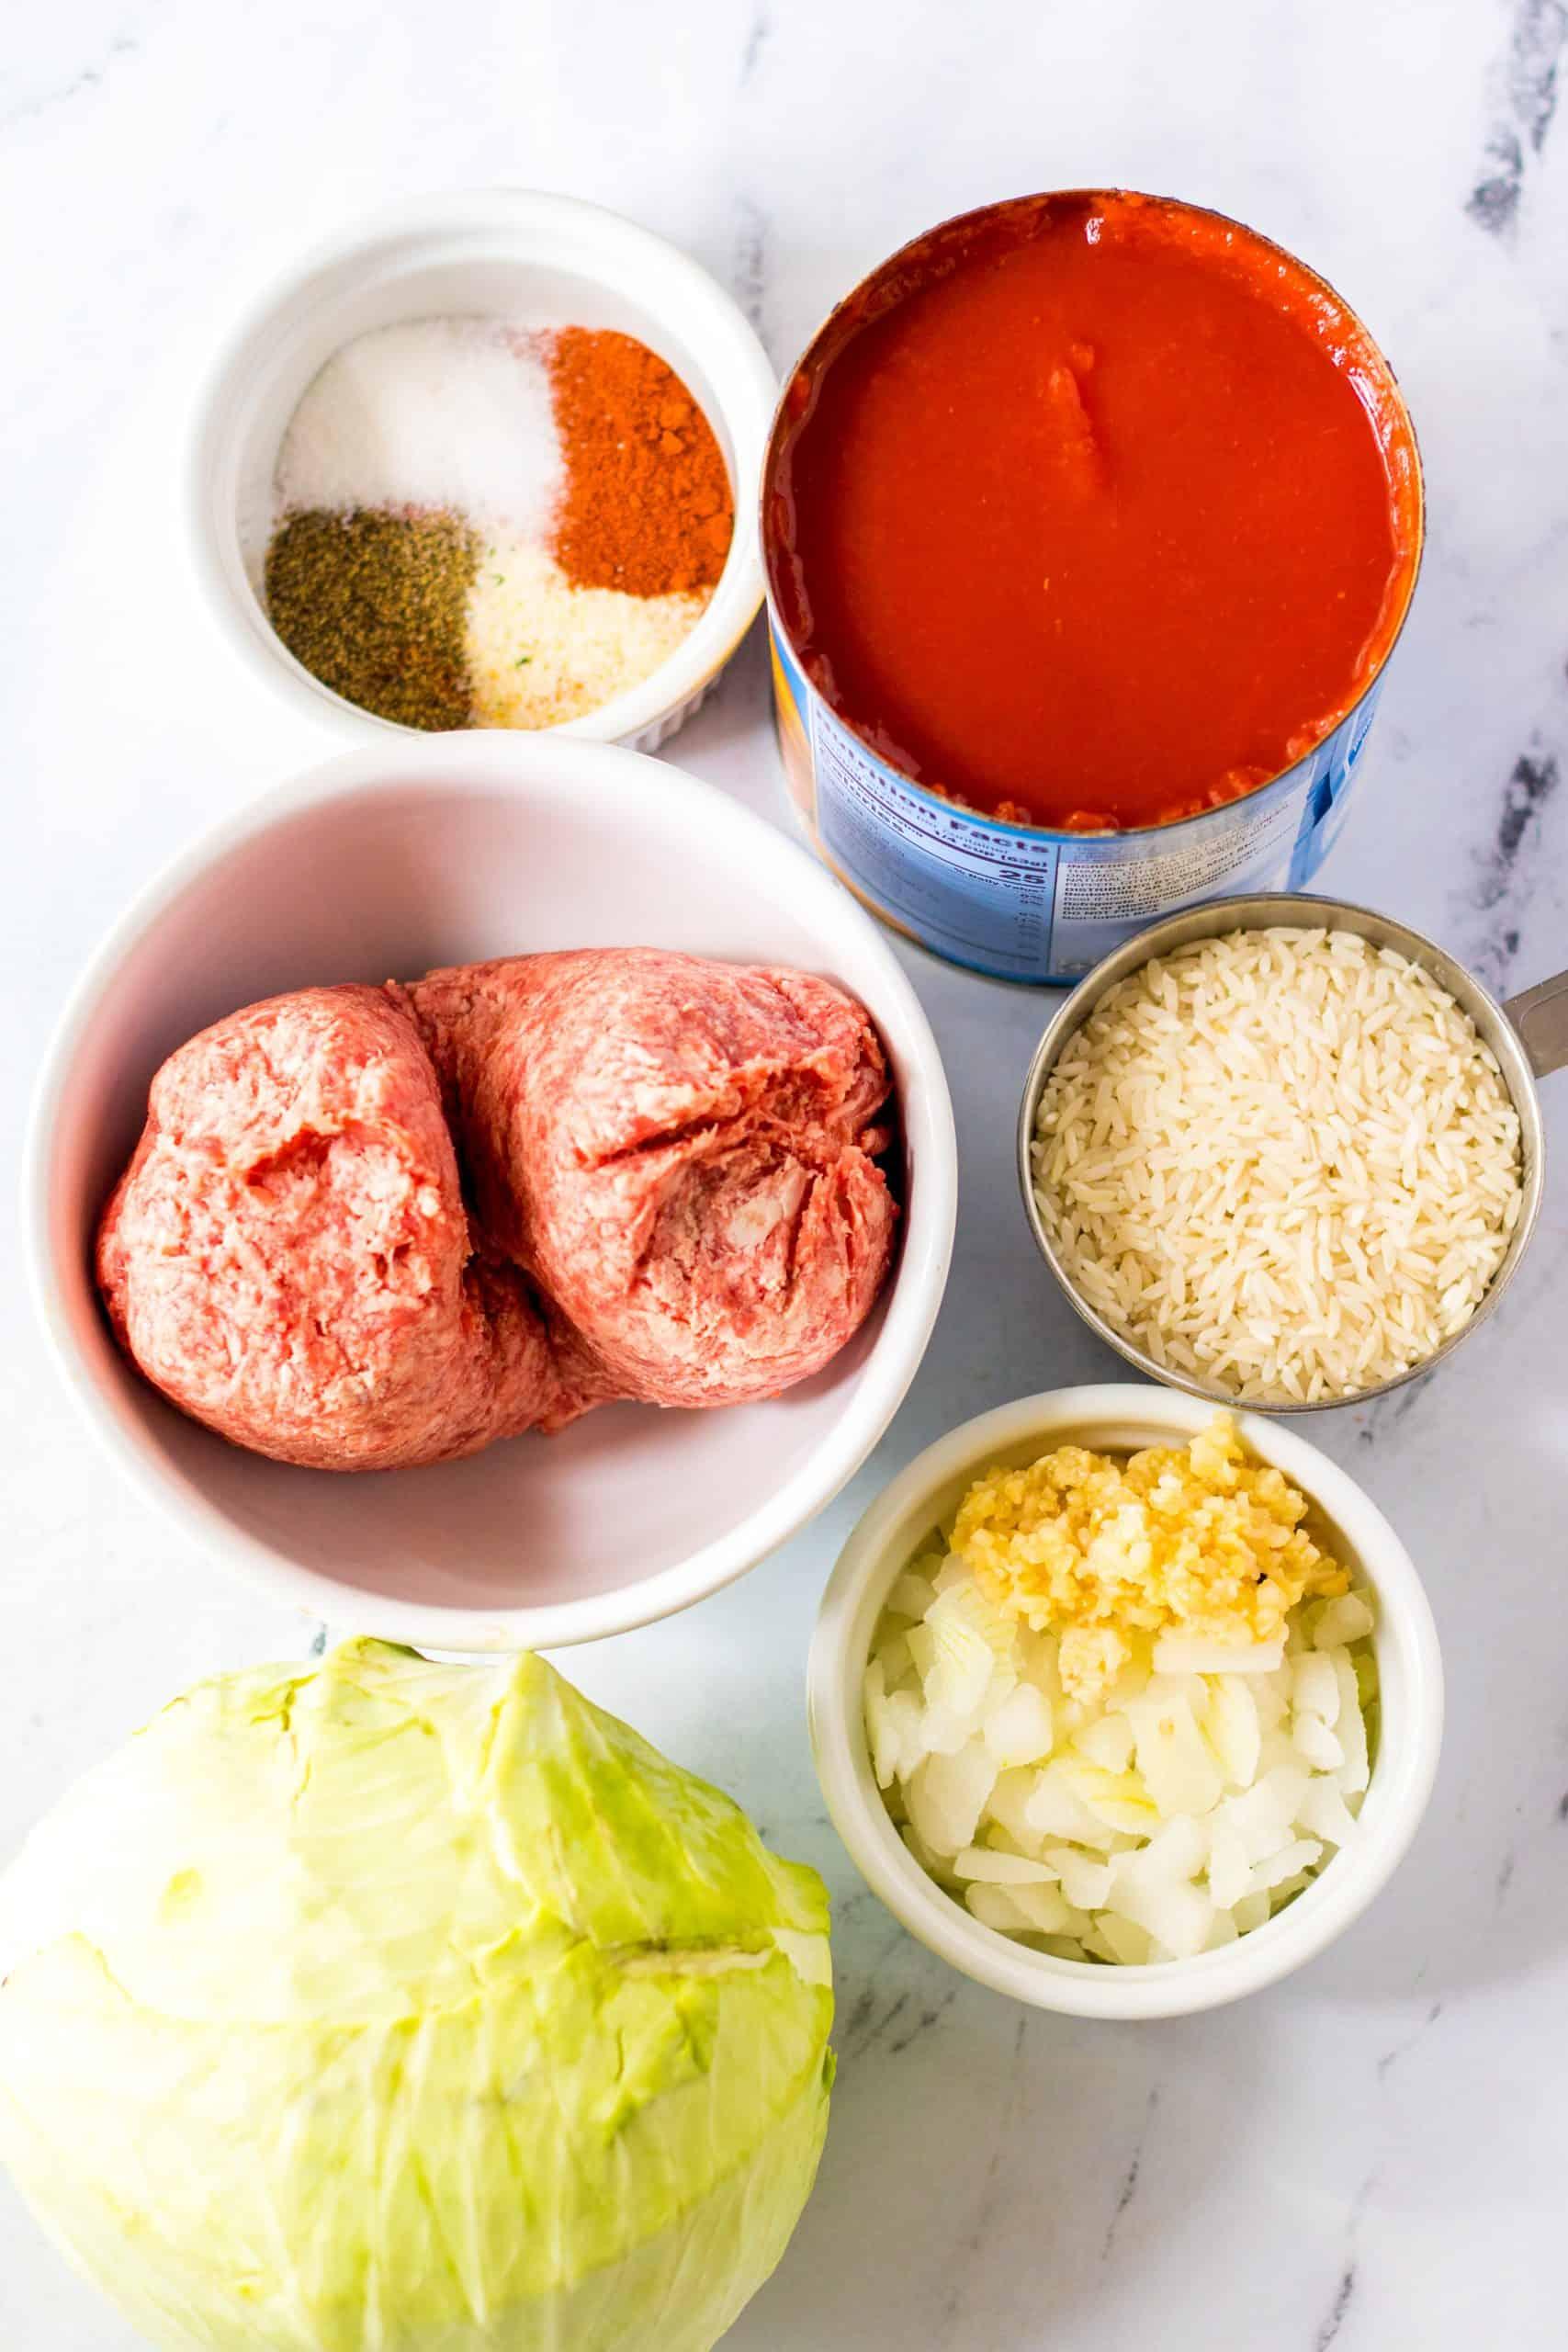 Ingredients need to make Crock Pot Unstuffed Cabbage Rolls: ground beef, garlic, onion, cabbage, water, white rice, pepper, garlic salt, paprika, sugar, tomato sauce.